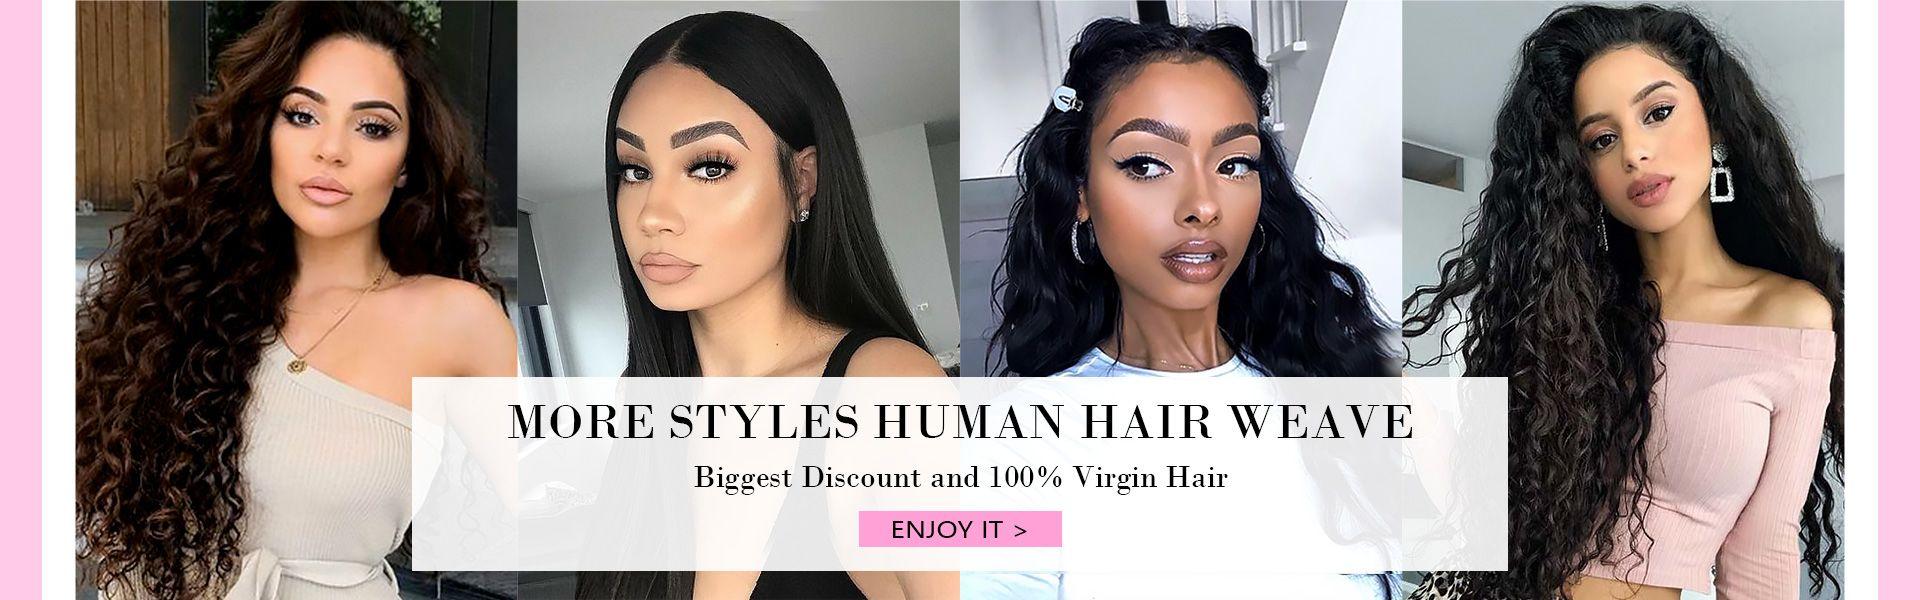 https://www.todayonlyhair.com/human-hair-weave.html